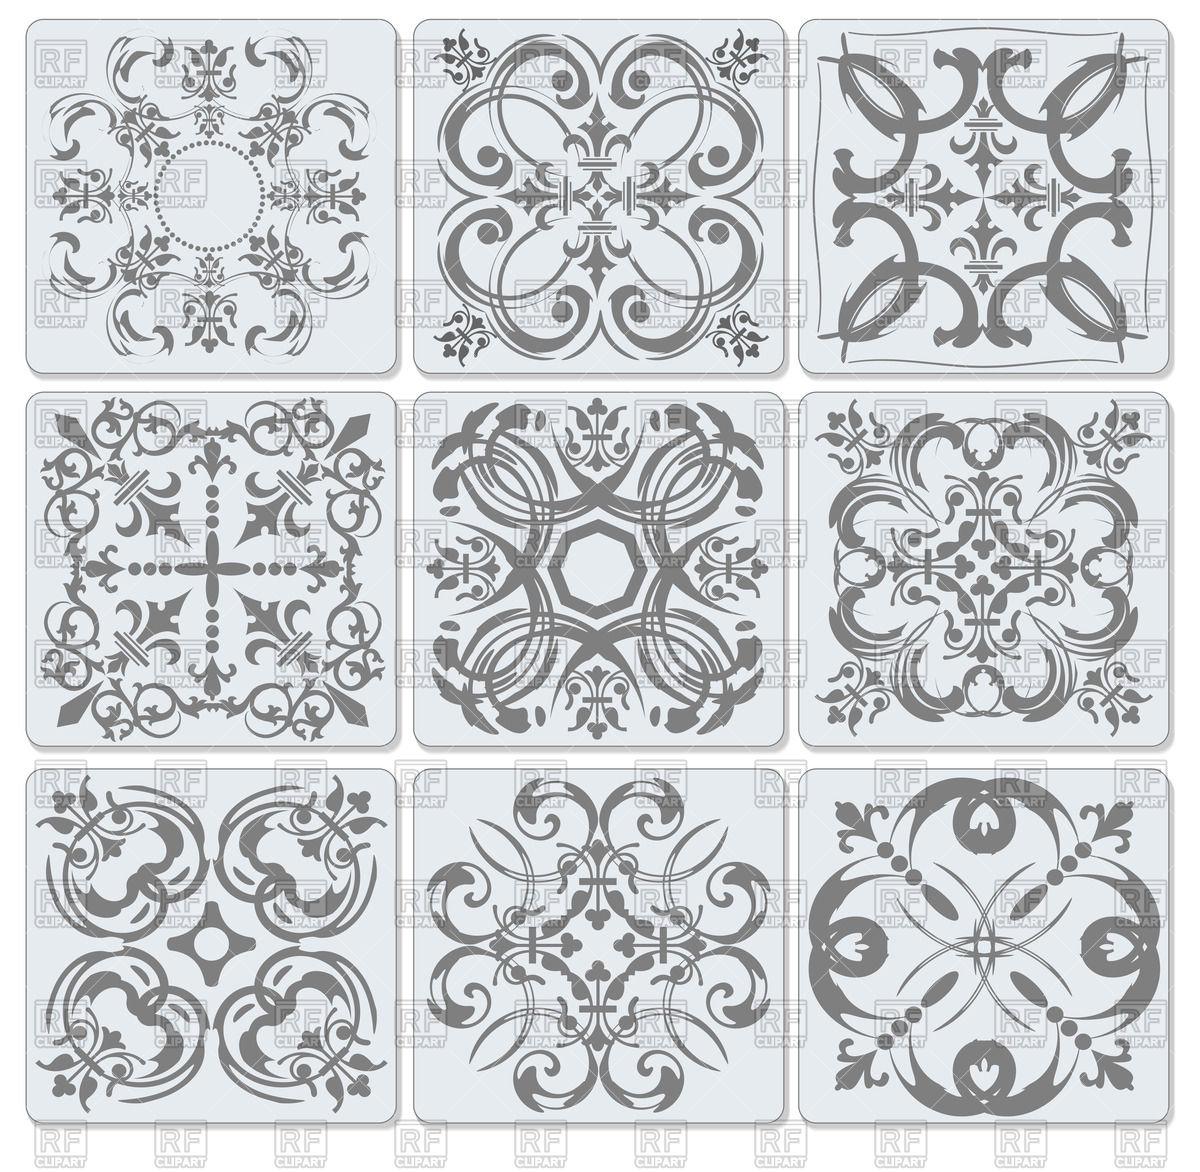 Decorative finishing bath room ceramic tiles with elegant.